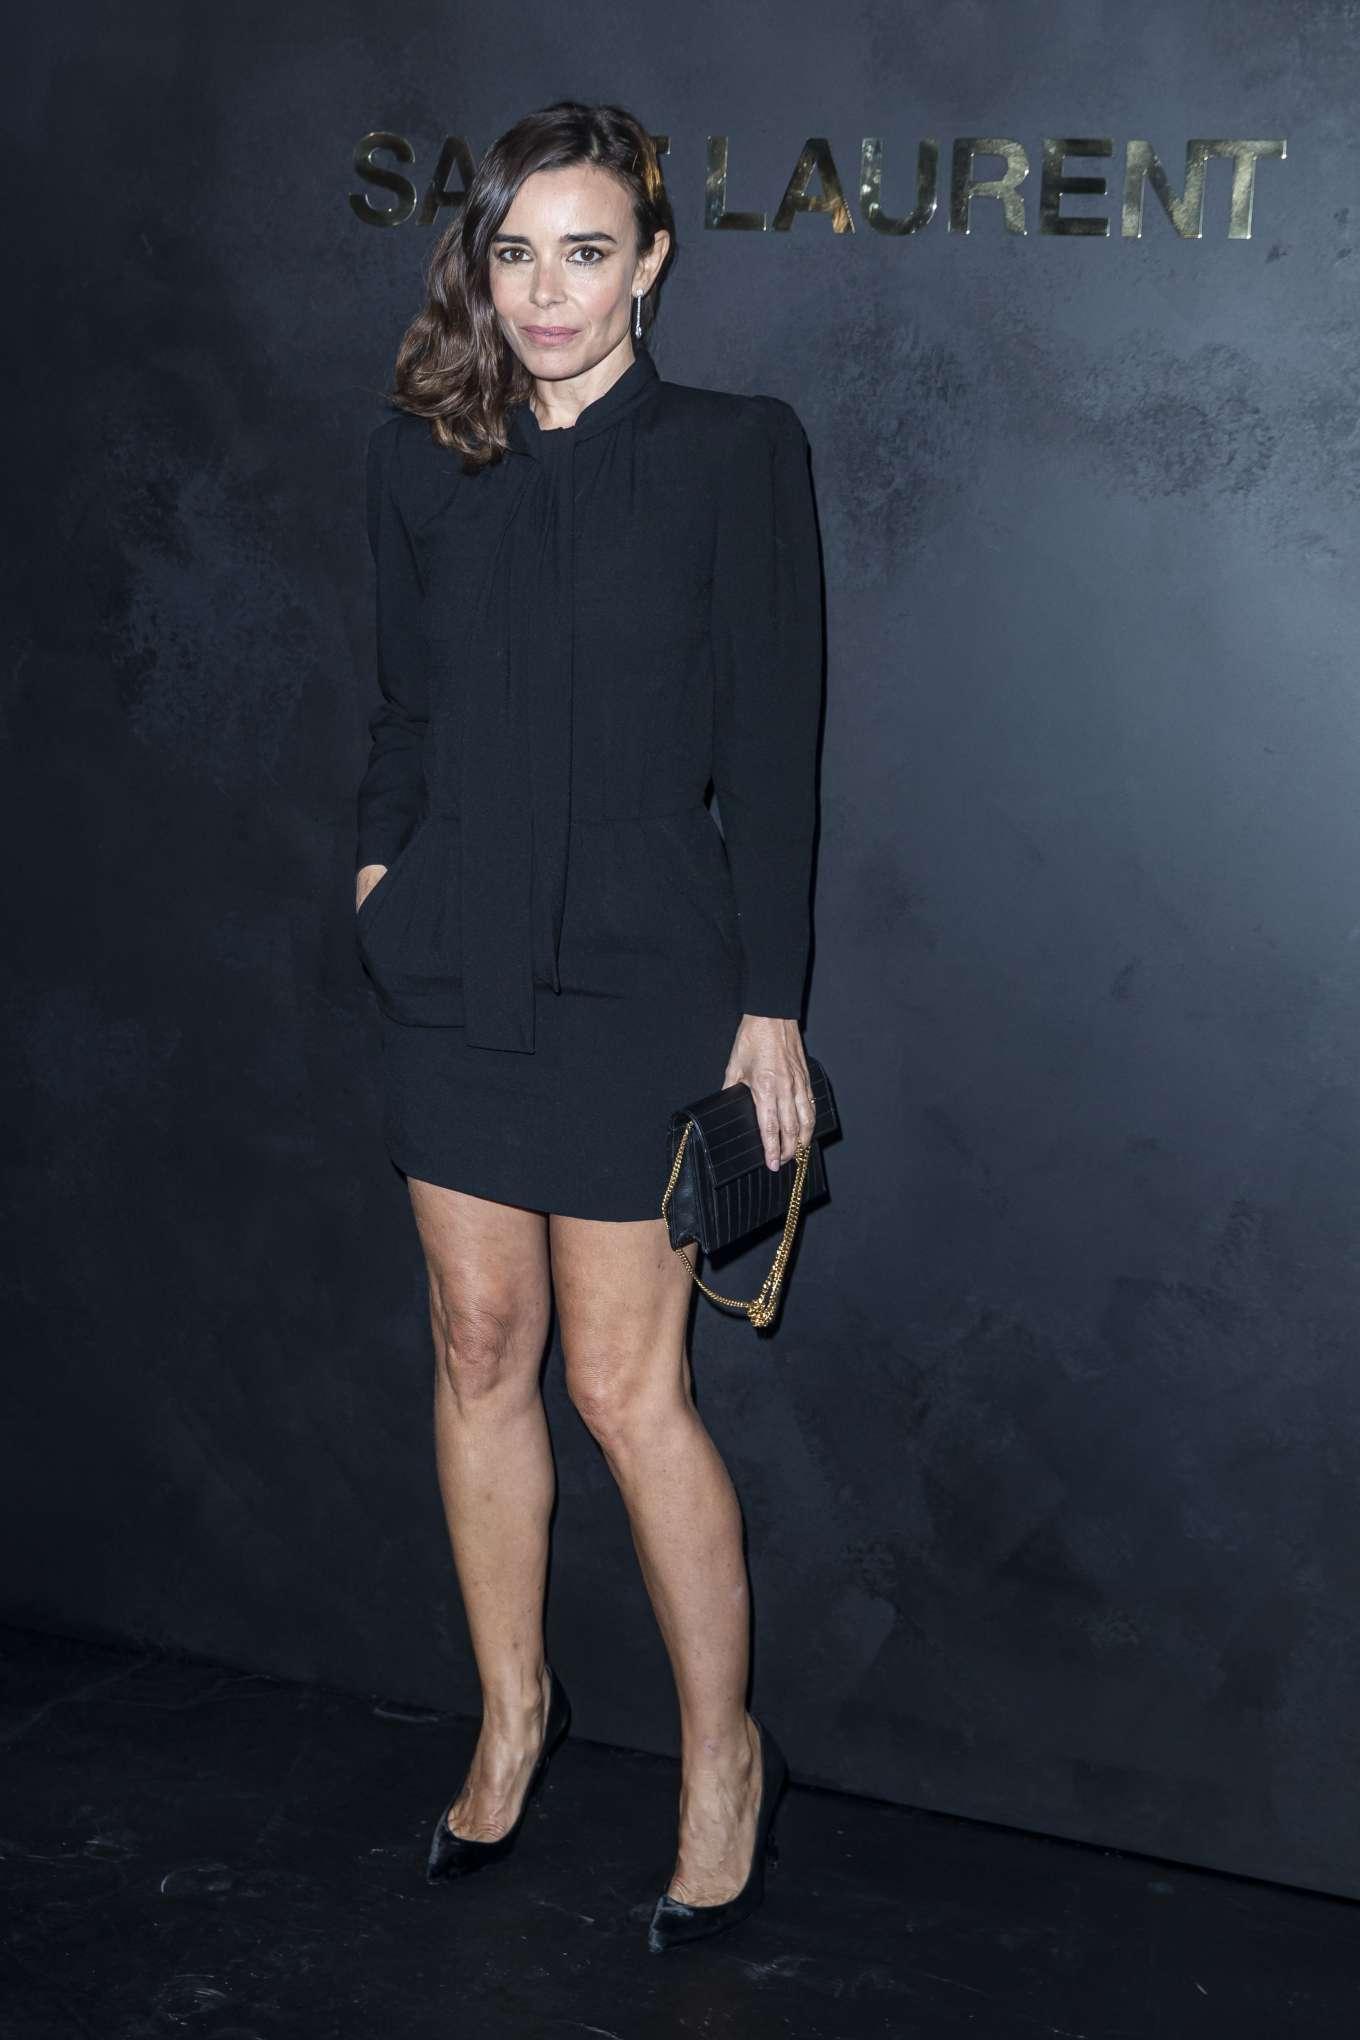 Elodie Bouchez 2019 : Elodie Bouchez – Saint Laurent Womenswear SS 2020 Show at Paris Fashion Week-16